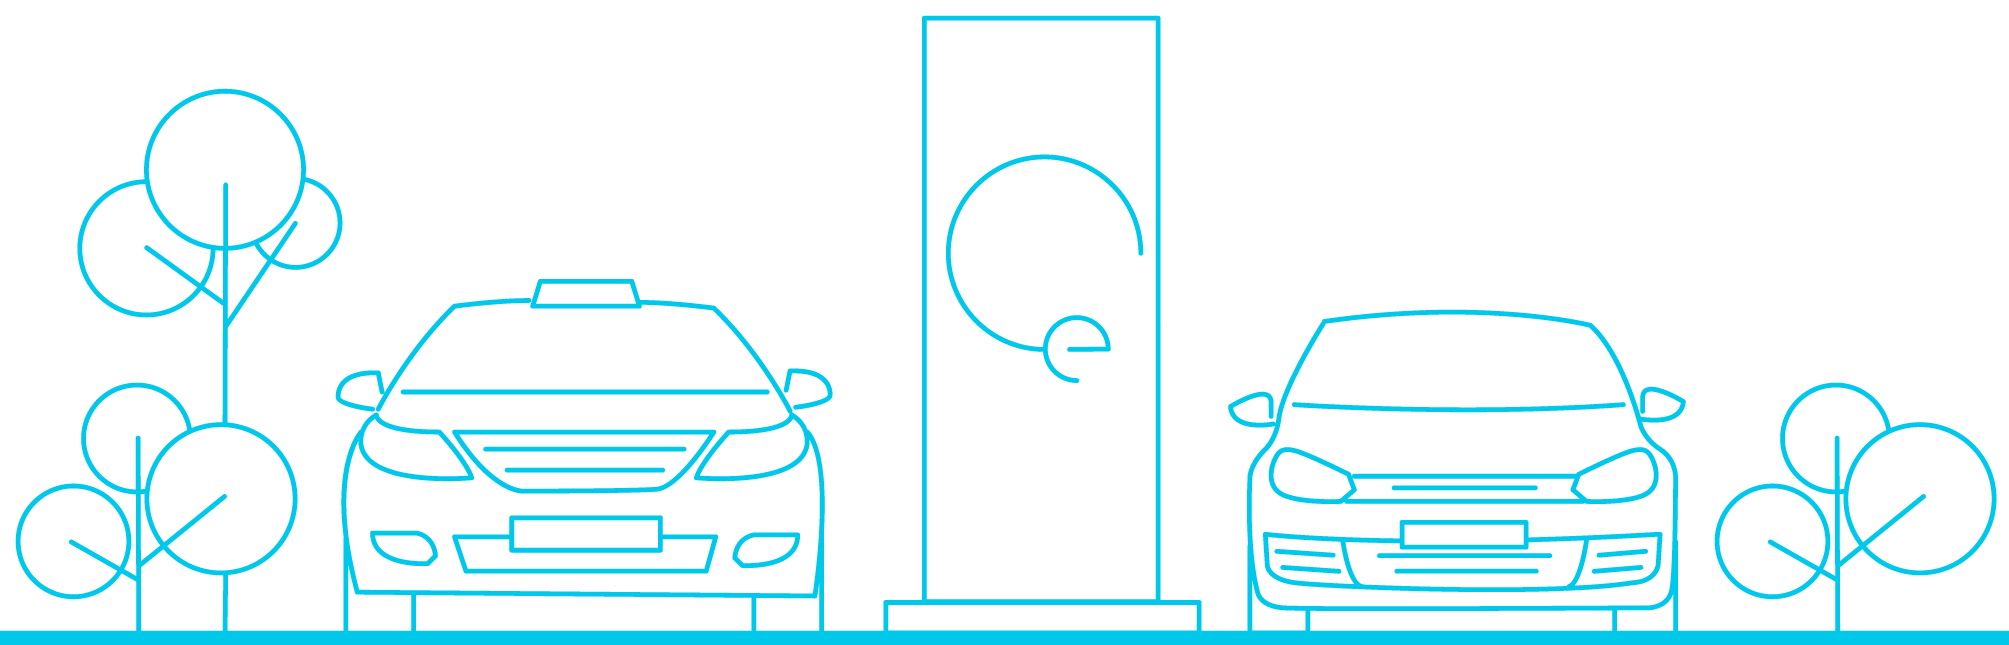 Indra - Car Charging image